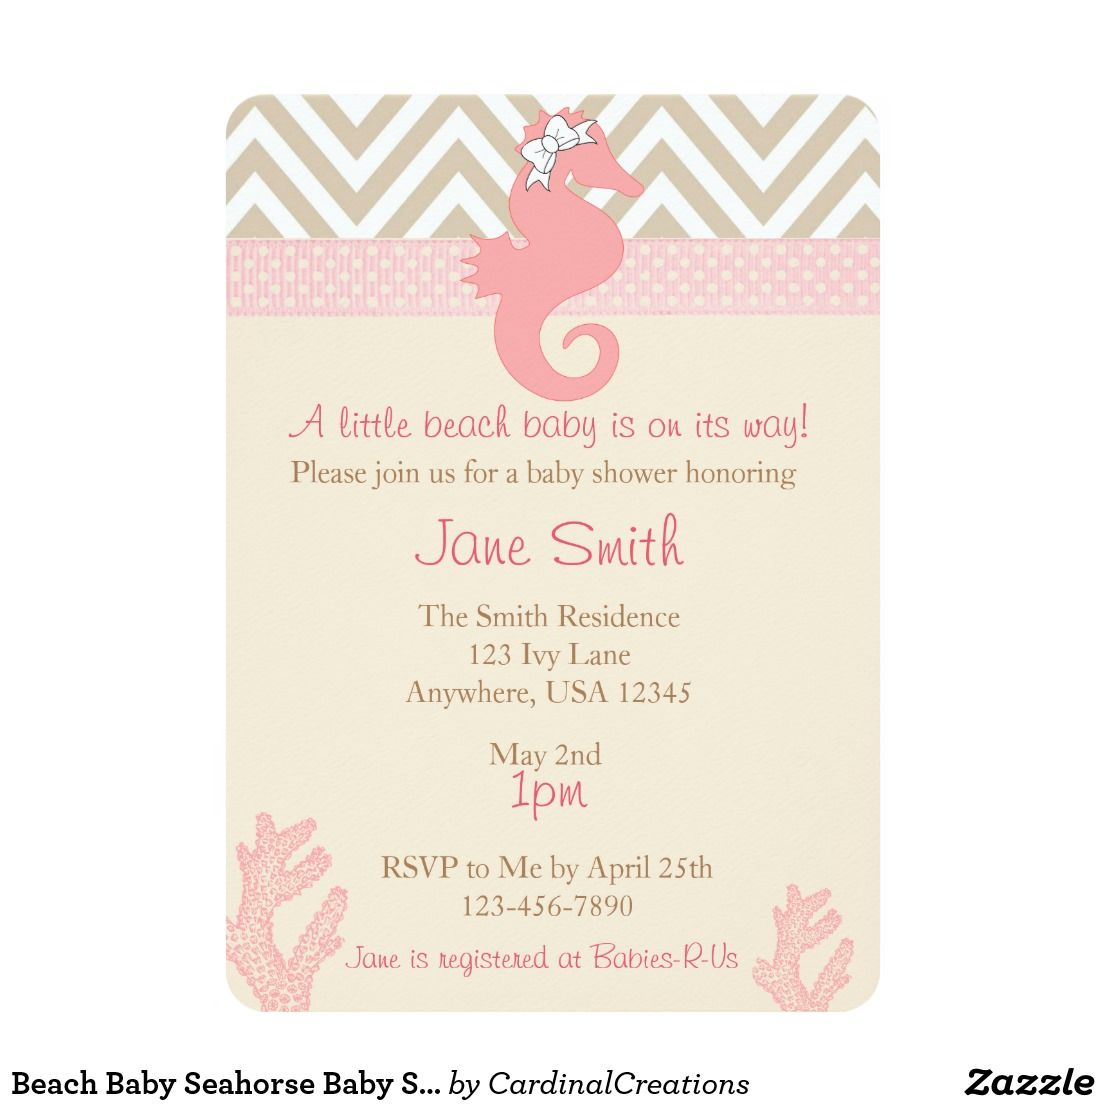 Beach Baby Seahorse Baby Shower Invitation   Baby seahorse and ...